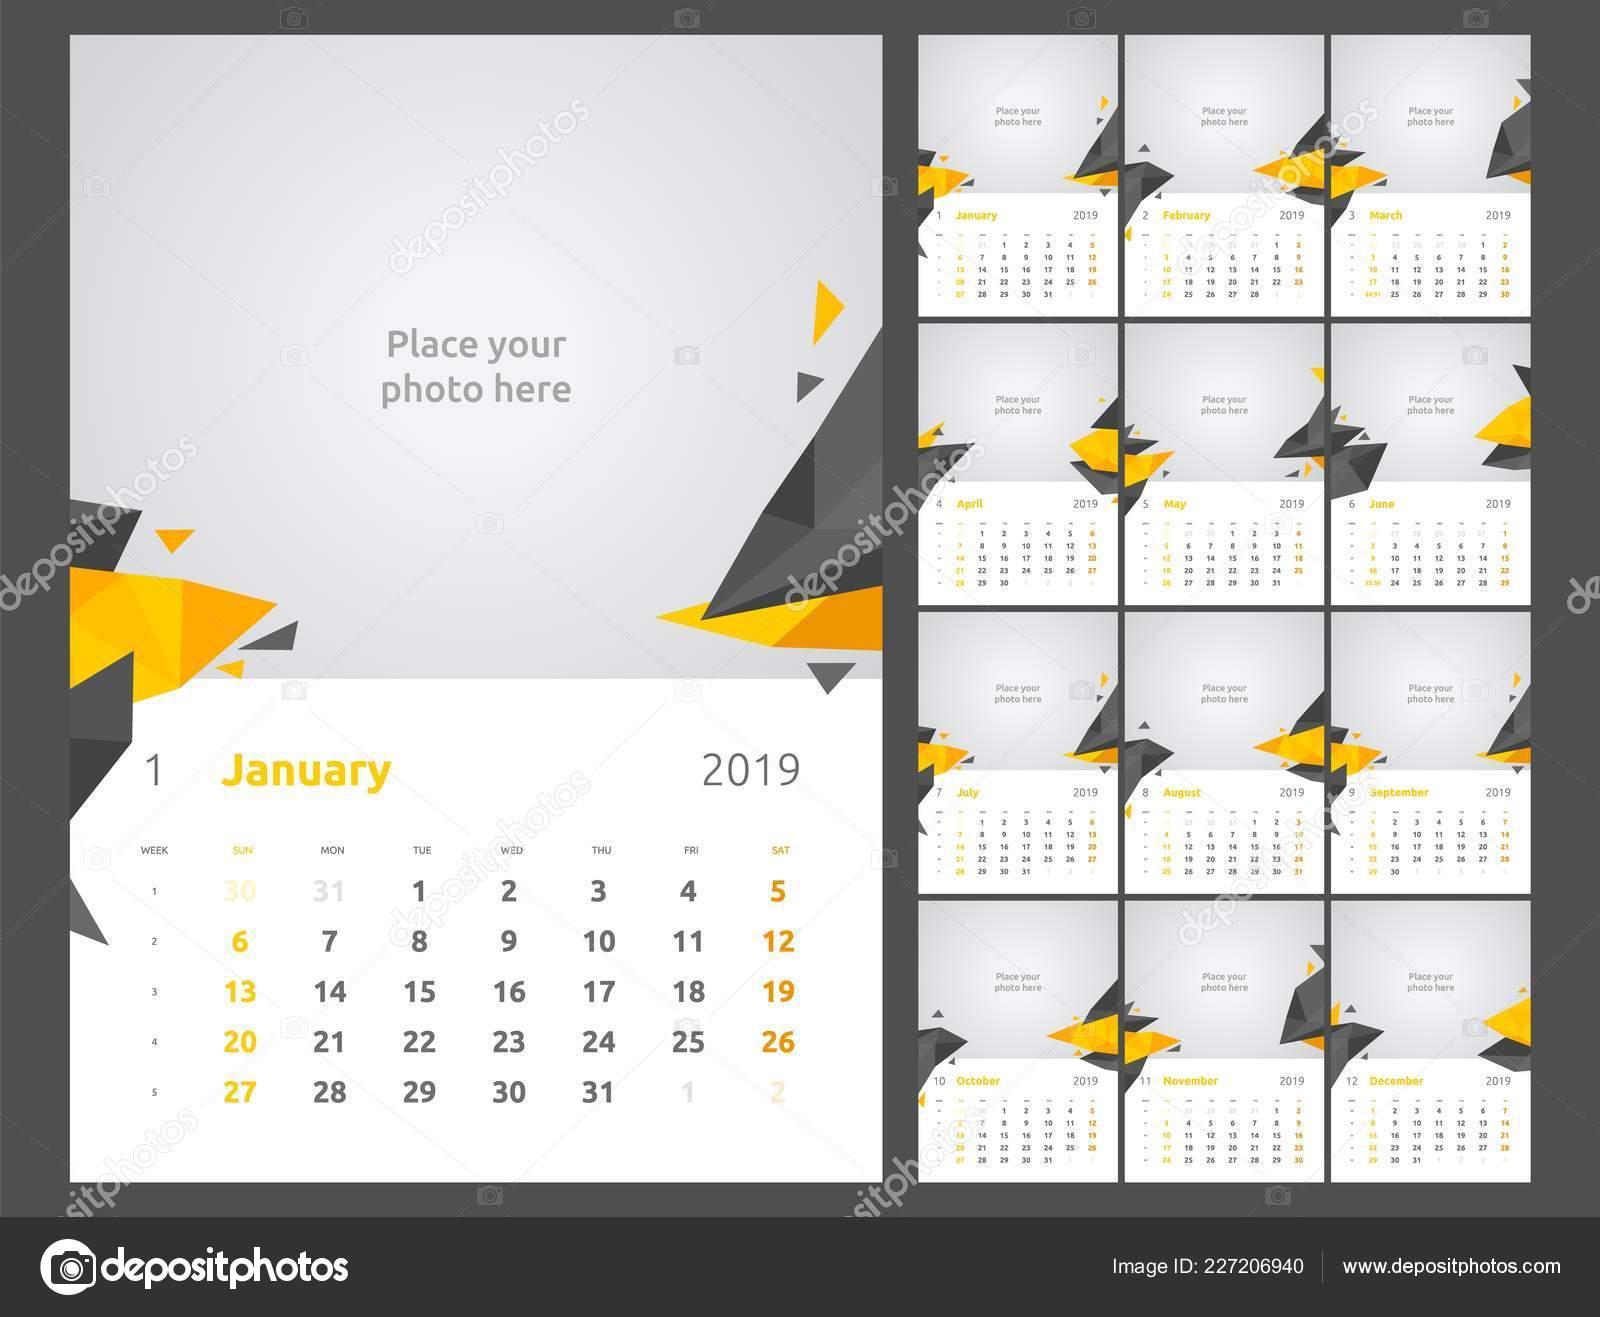 Calendar Pages To Print 2019.Calendar Design For 2019 Set Of 12 Calendar Pages Vector Design